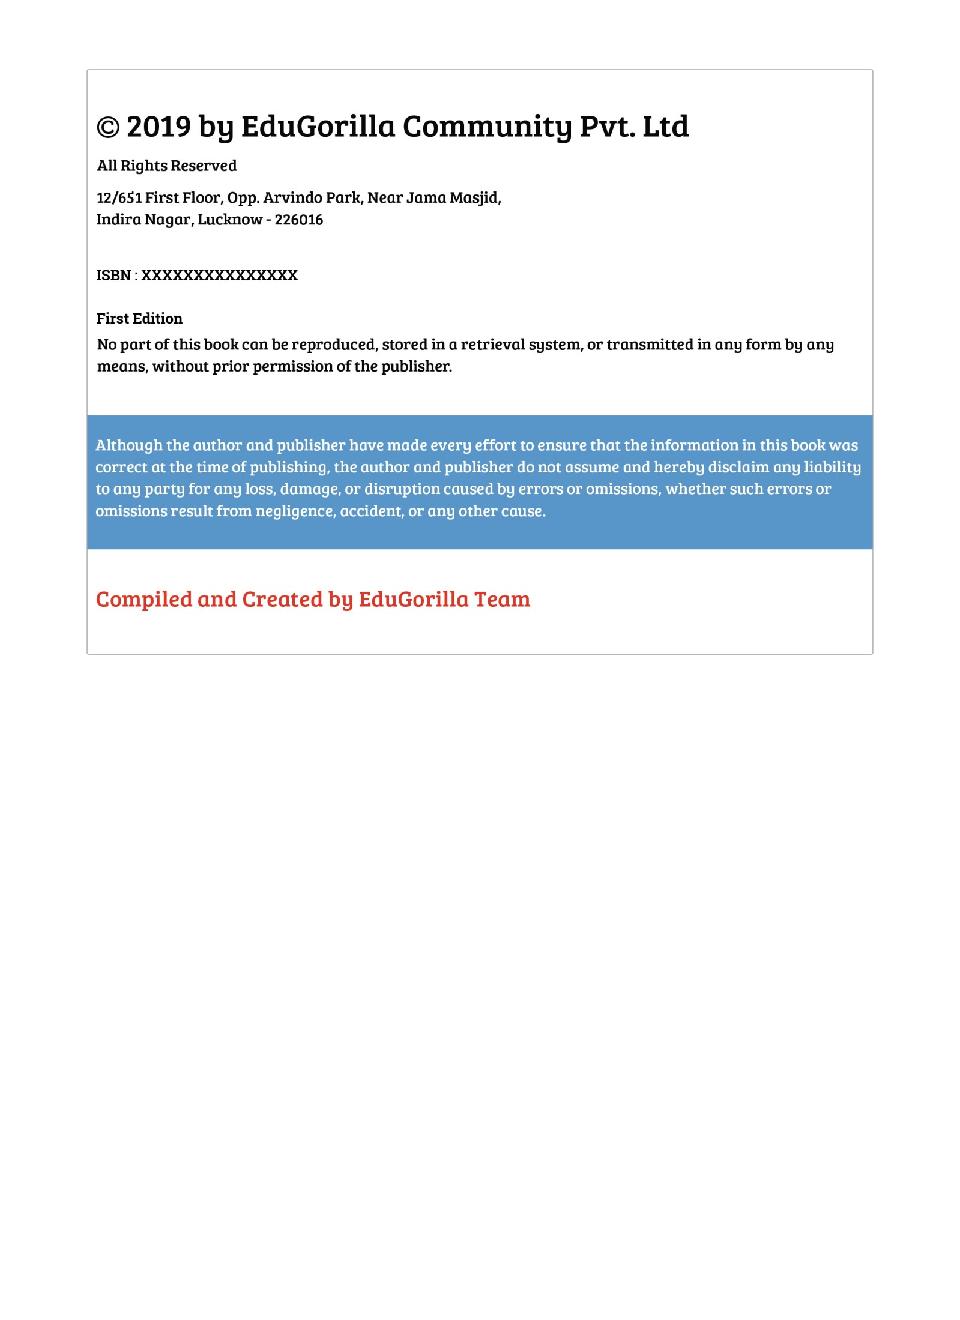 EduGorilla SSC CGL: 2020 Tier-I (Practice Kit) - Page 5